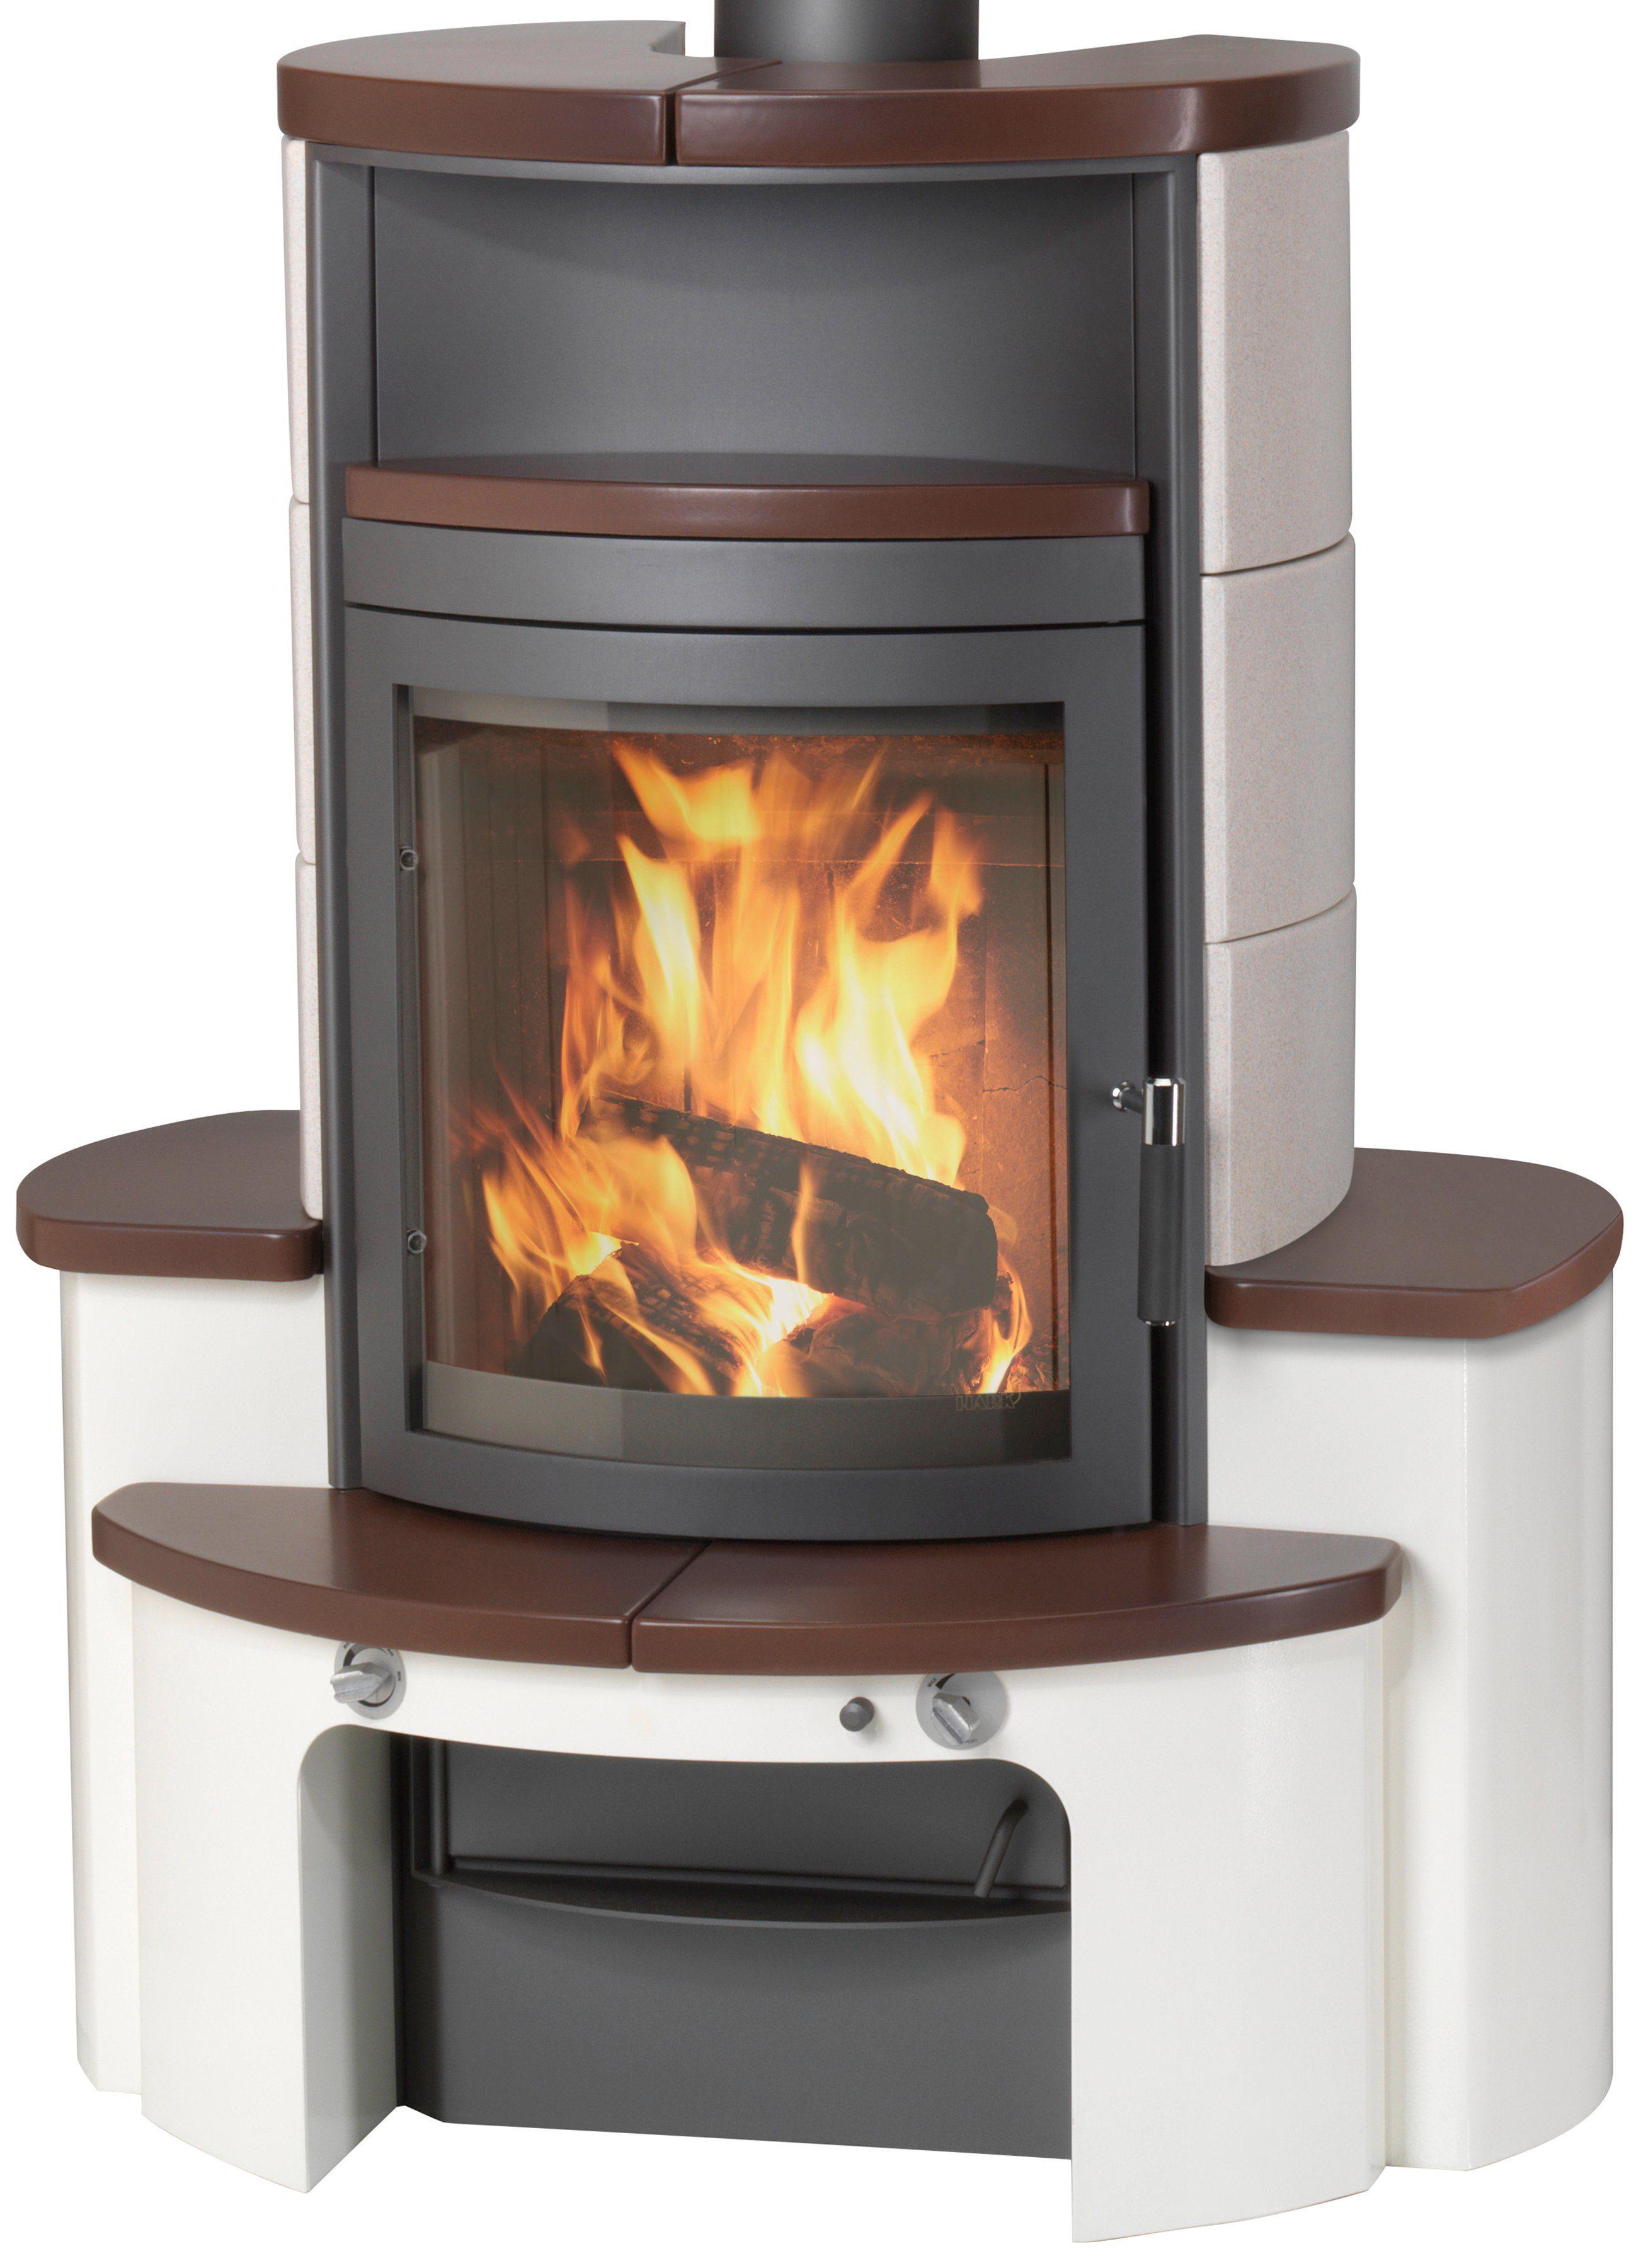 hark kaminofen avenso kachel jola braun 7 kw dauerbrand automatik online kaufen otto. Black Bedroom Furniture Sets. Home Design Ideas